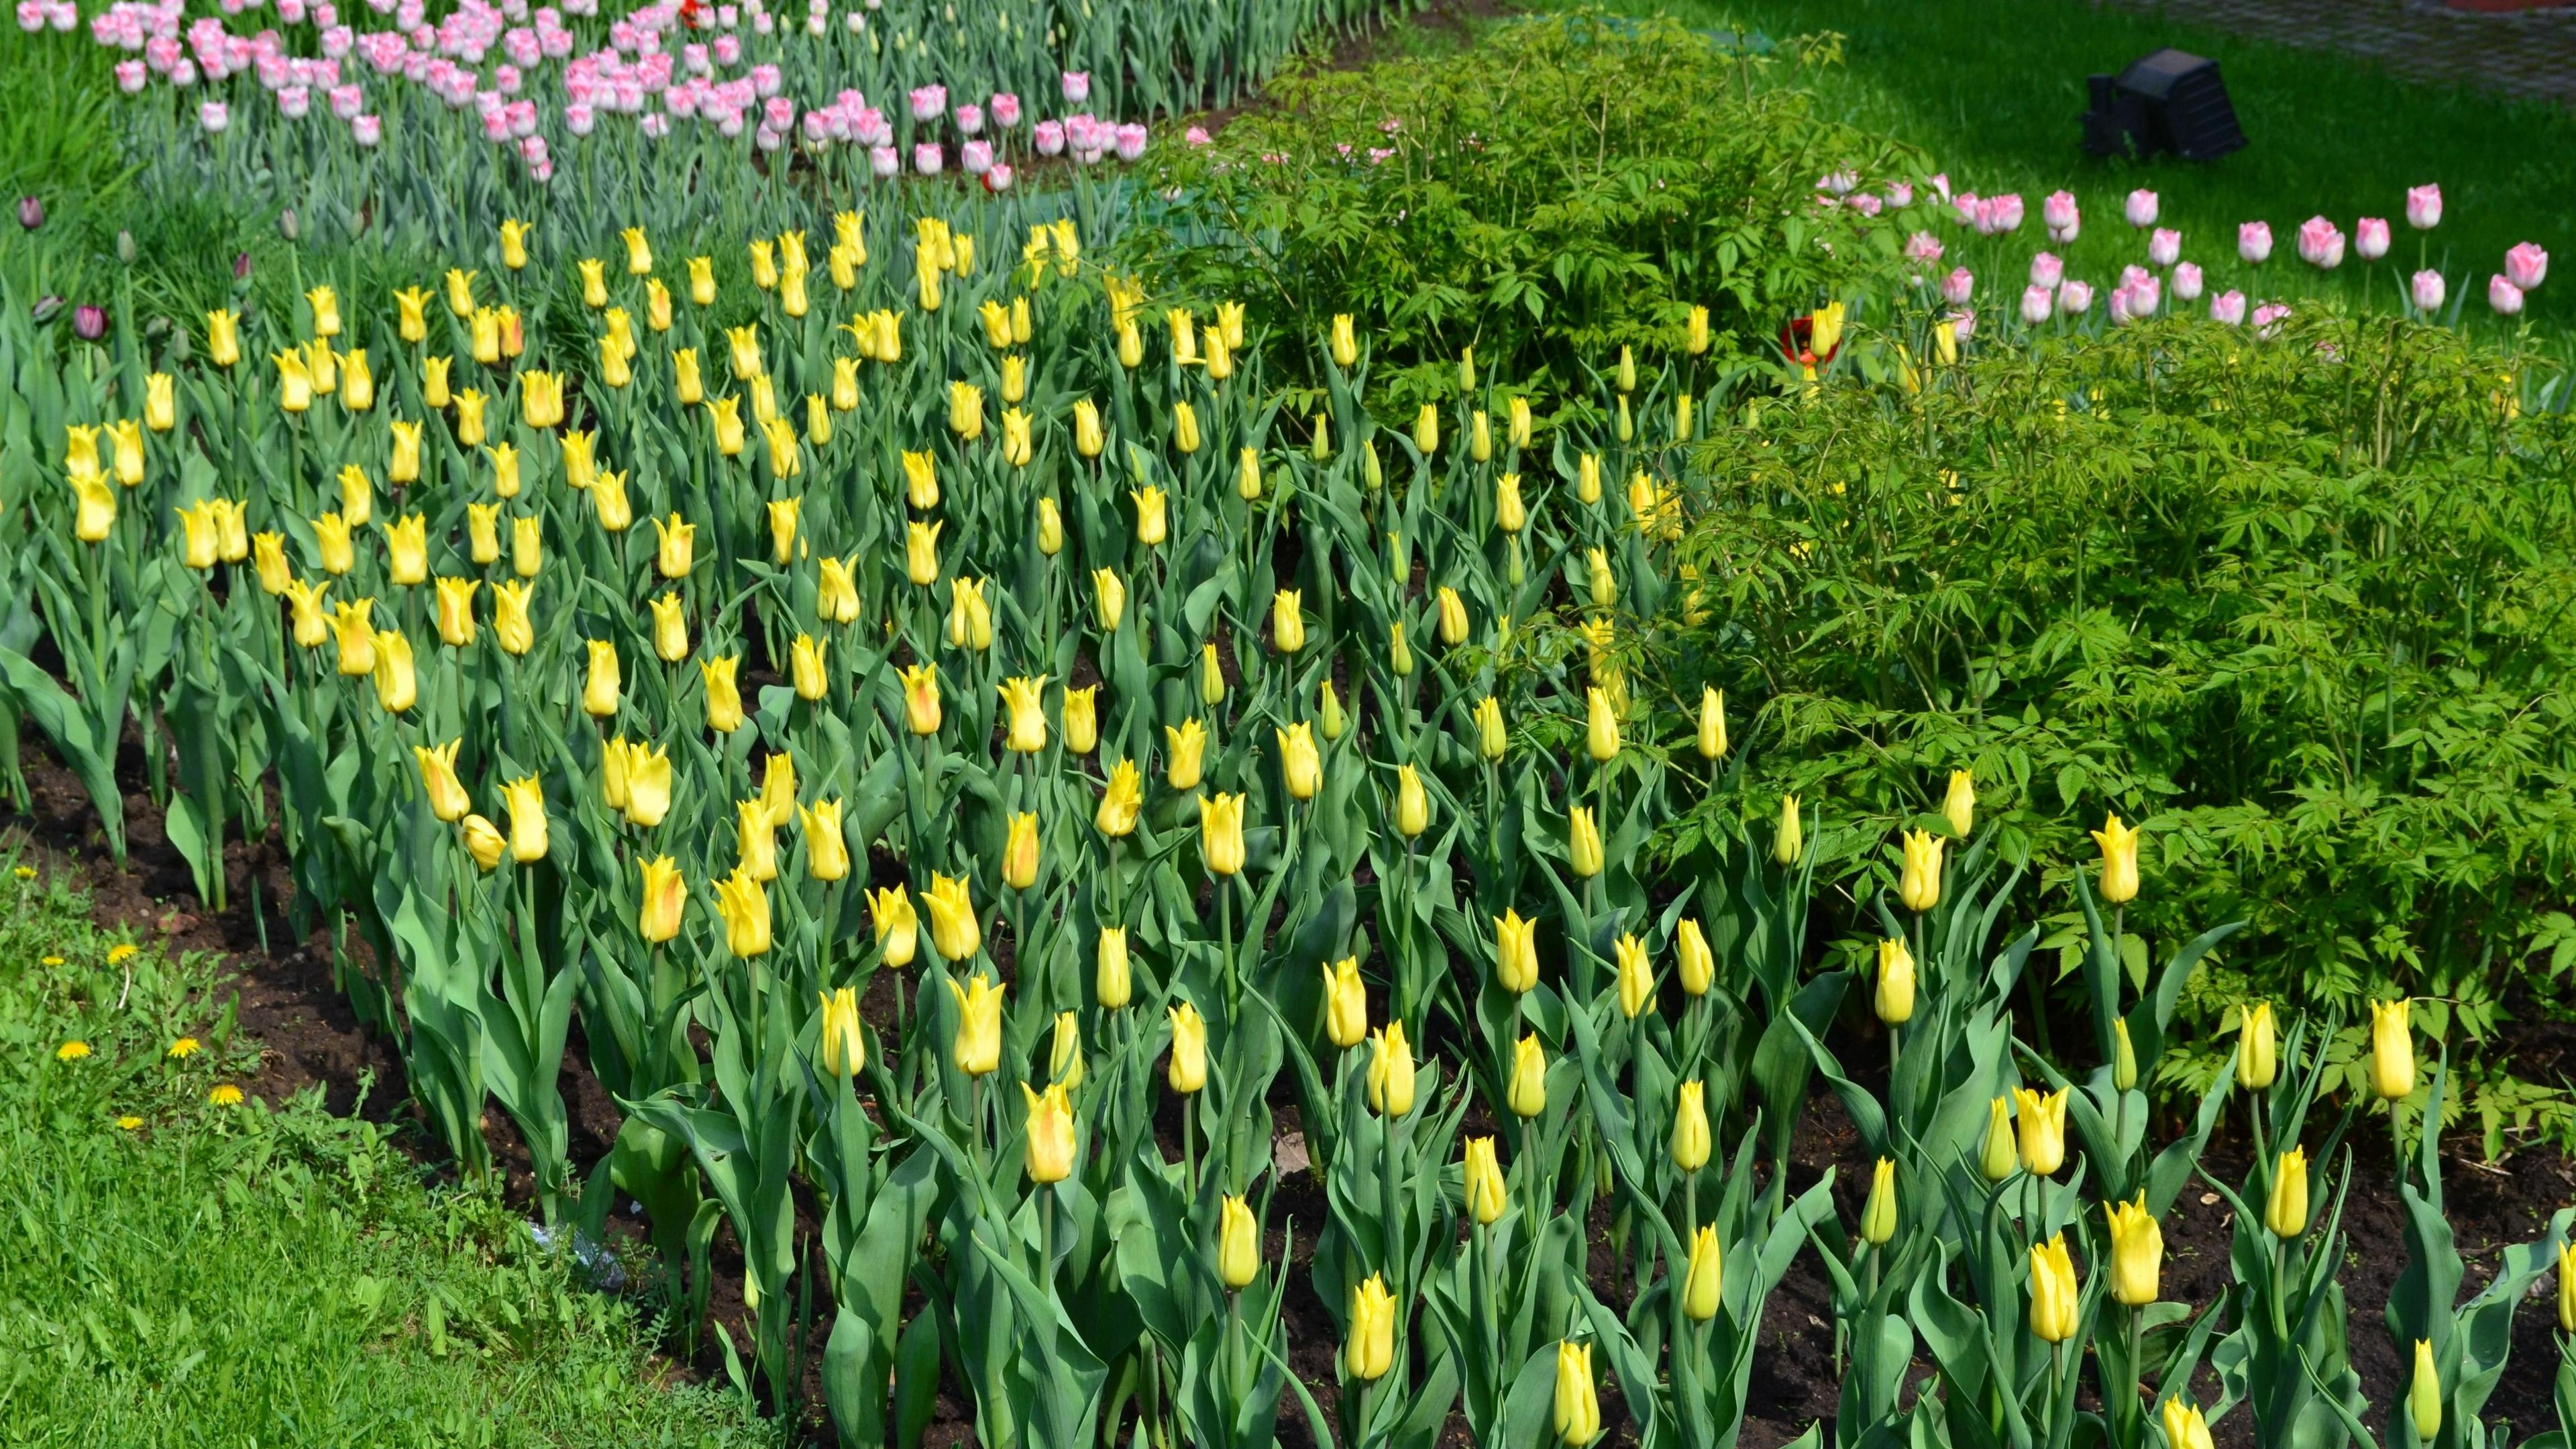 tulips flowers grass herbs 4k 1540064182 - tulips, flowers, grass, herbs 4k - Tulips, Grass, Flowers